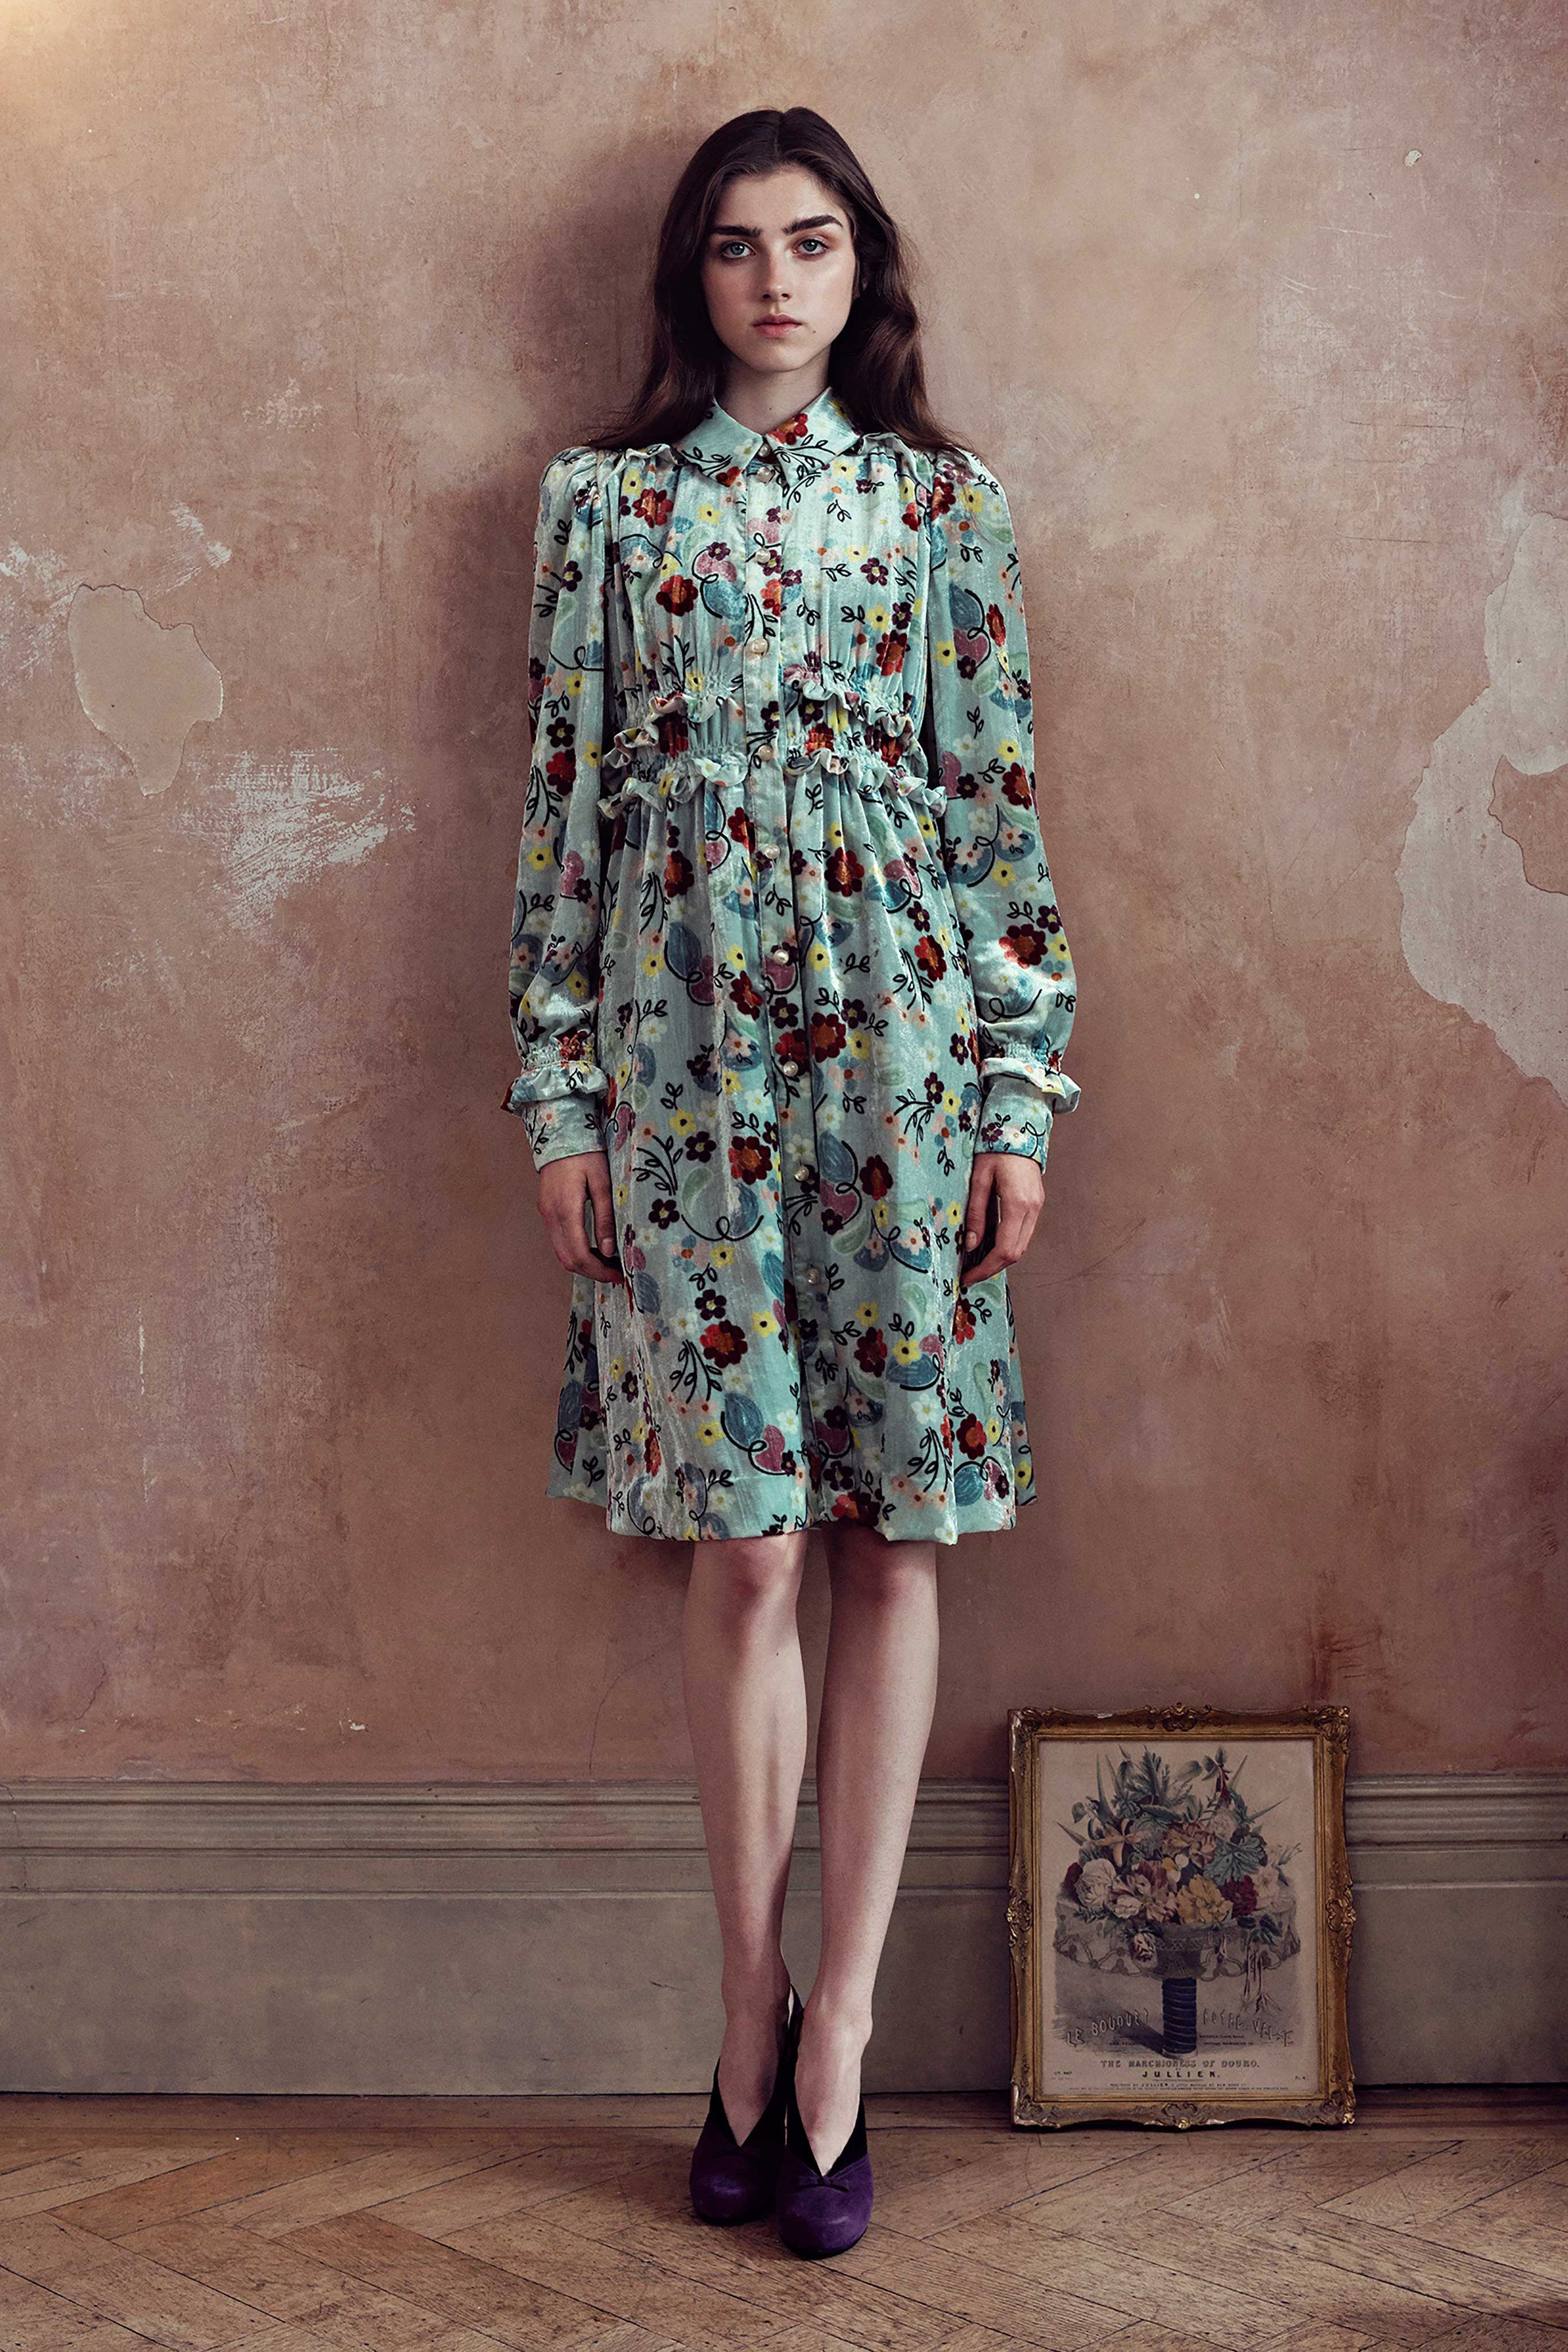 Orla Kiely SpringSummer 2019 Collection – London Fashion Week pics